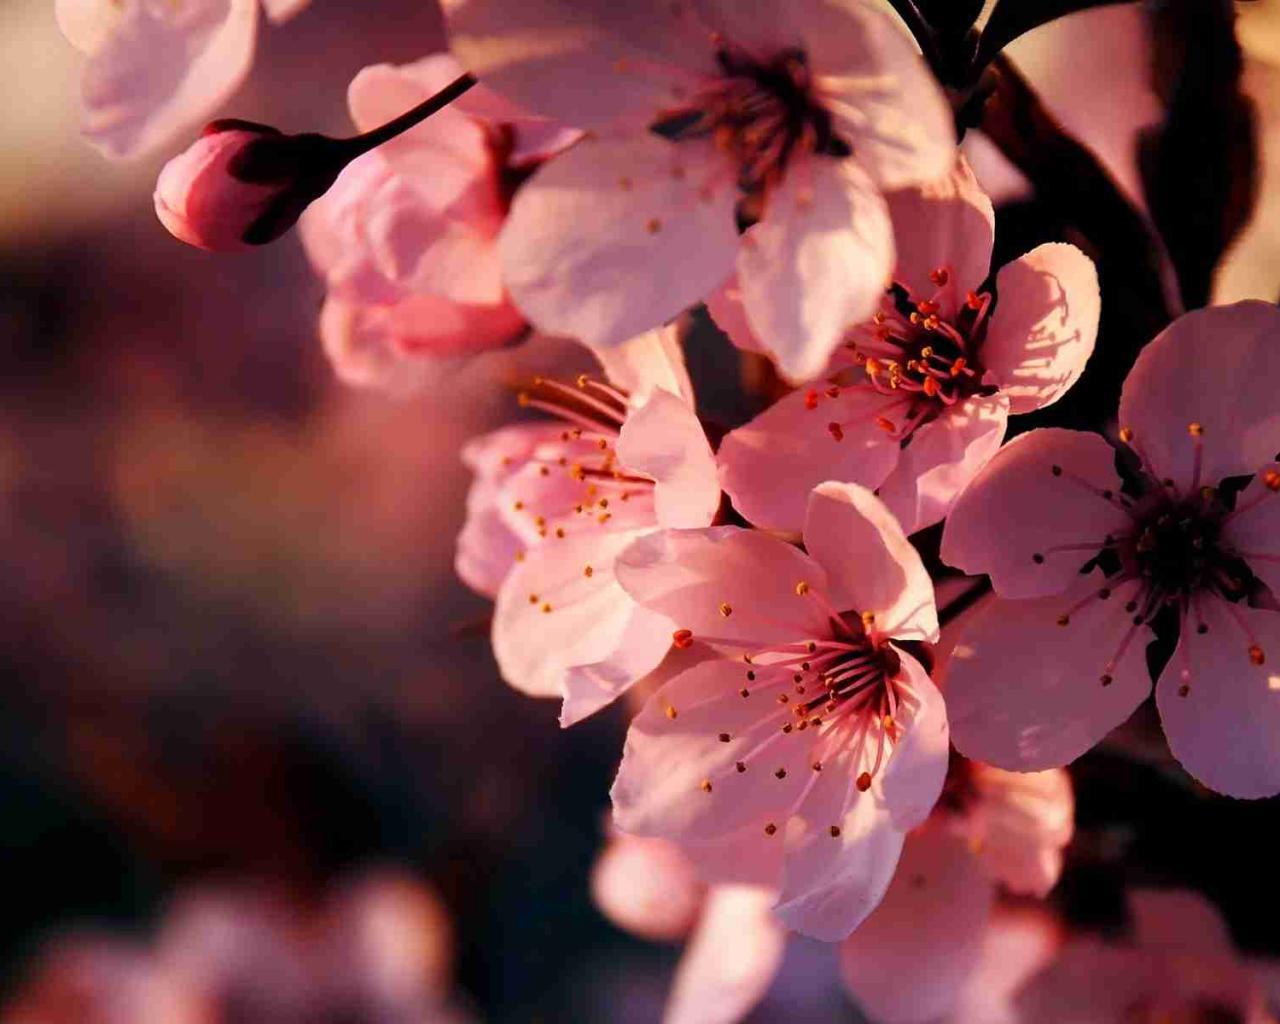 http://hq-wallpapers.ru/wallpapers/13/hq-wallpapers_ru_flowers_62392_1280x1024.jpg